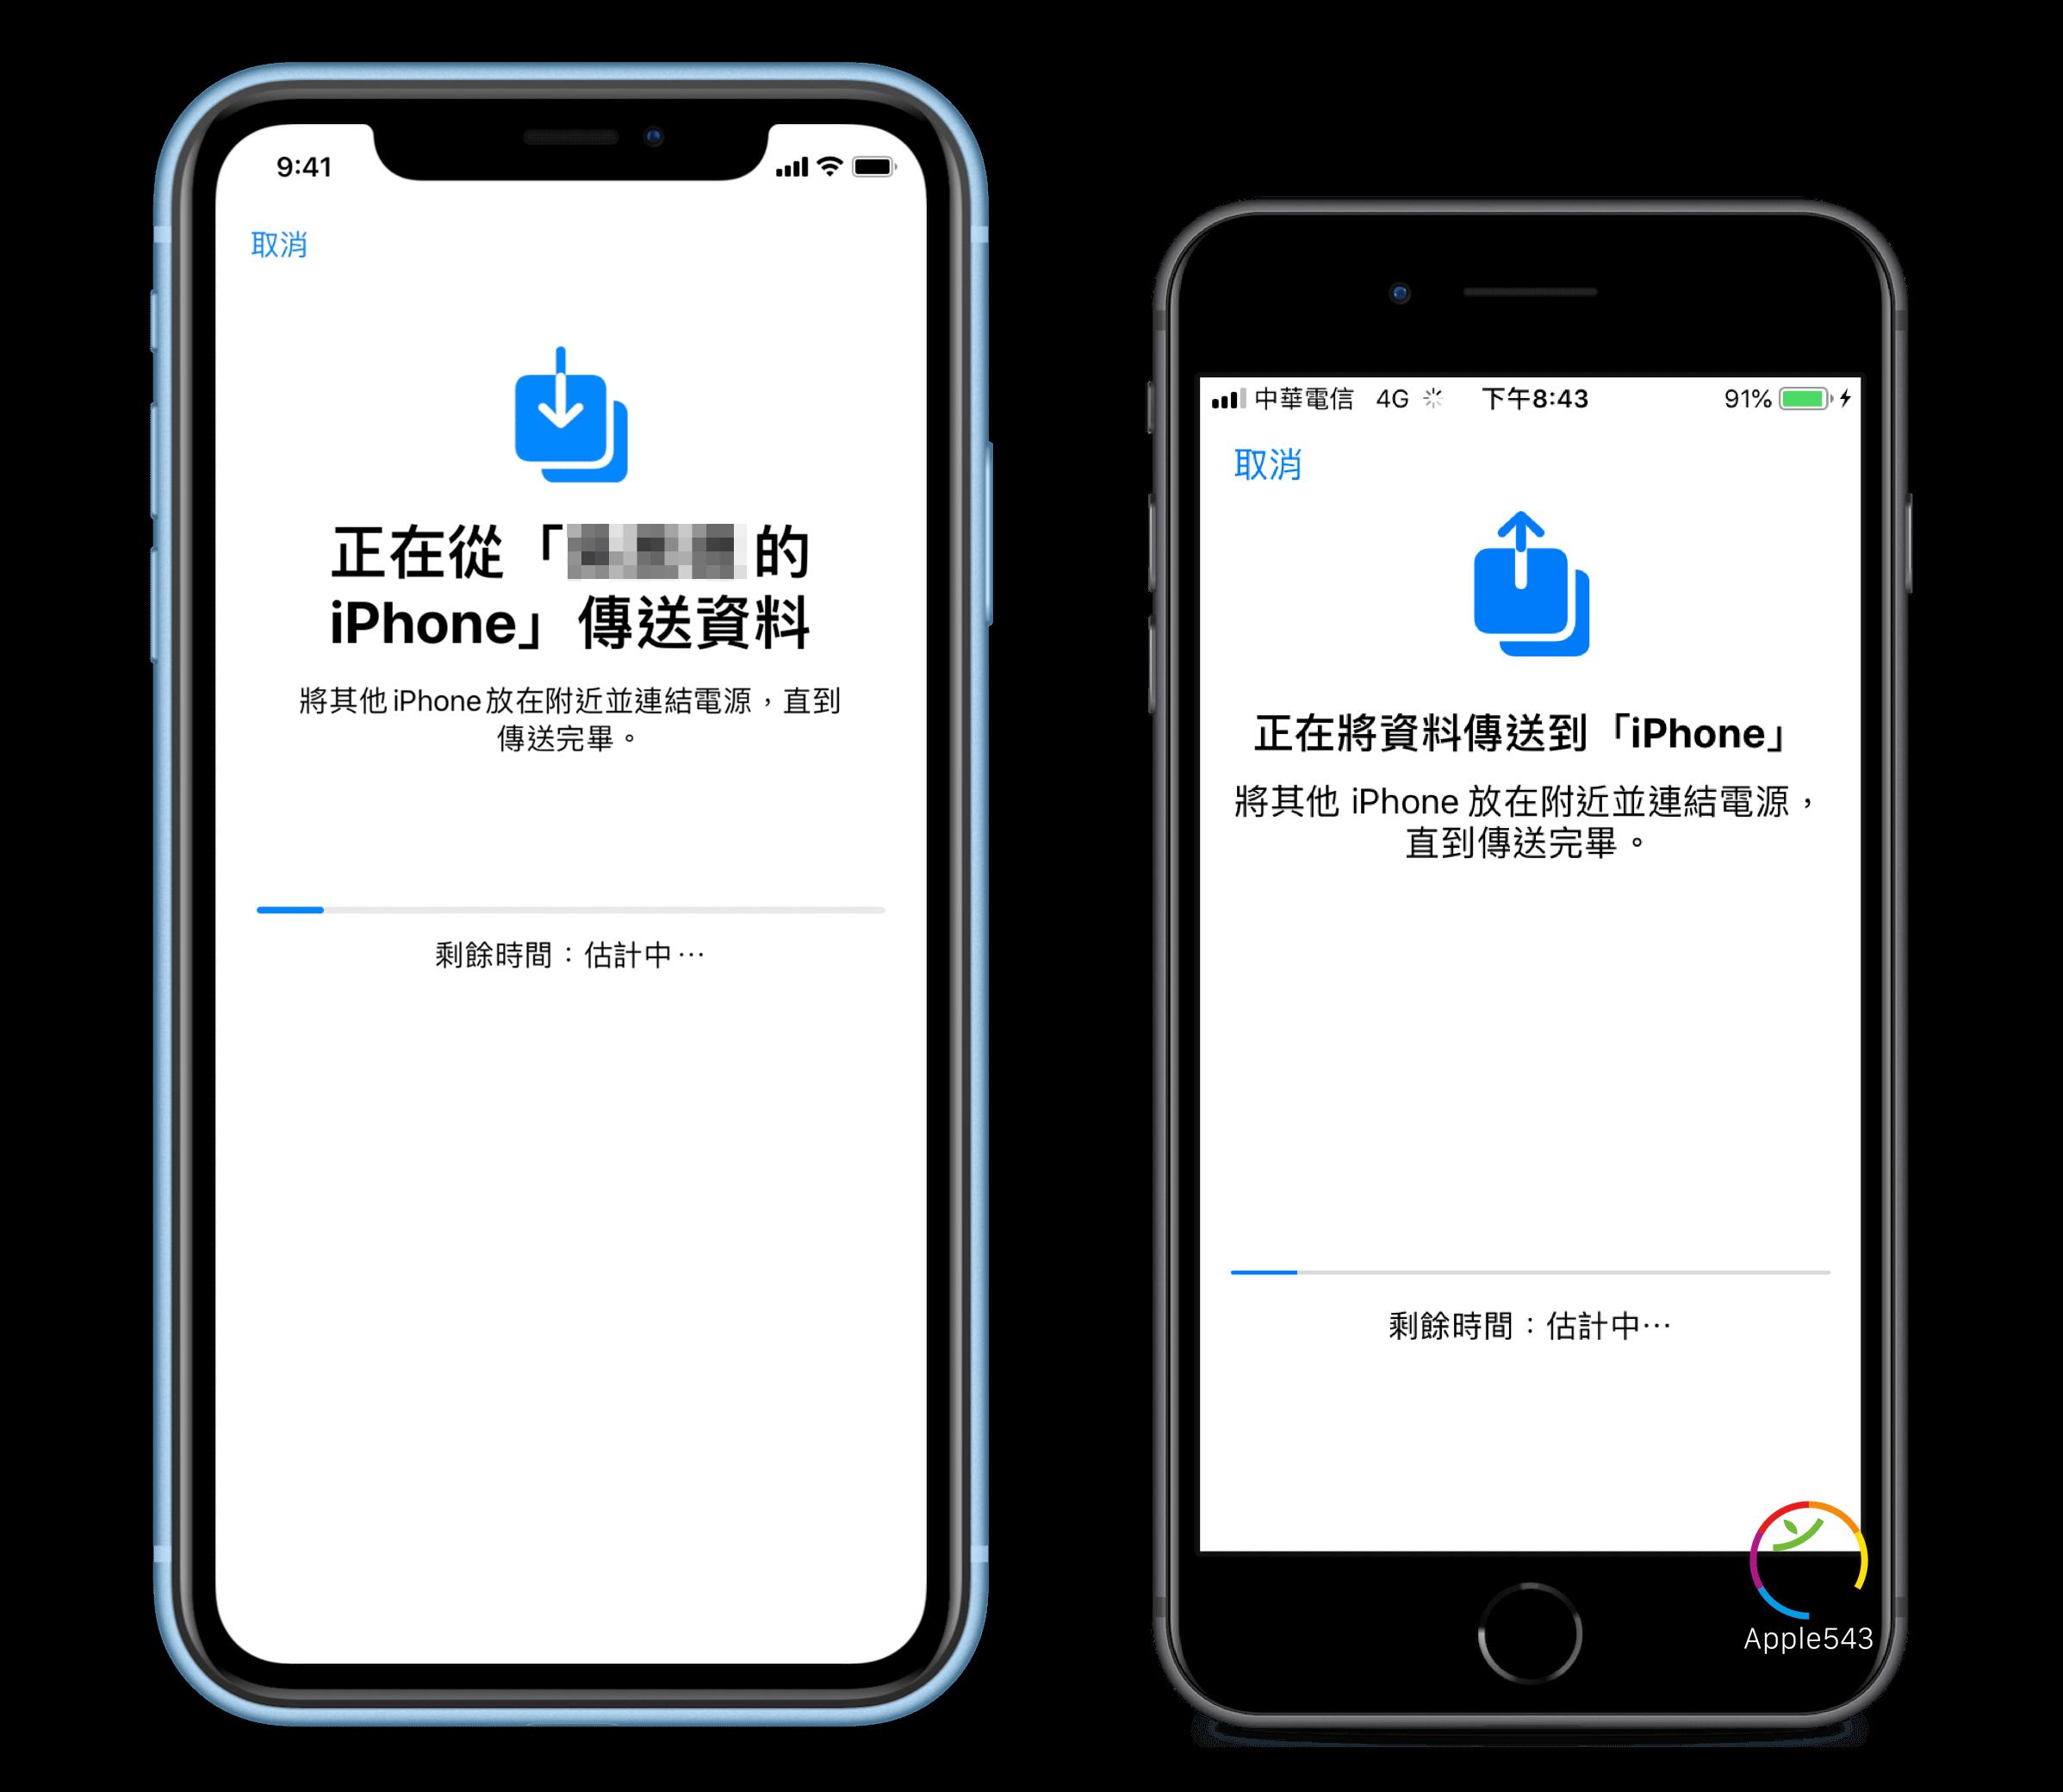 iPhone 轉移